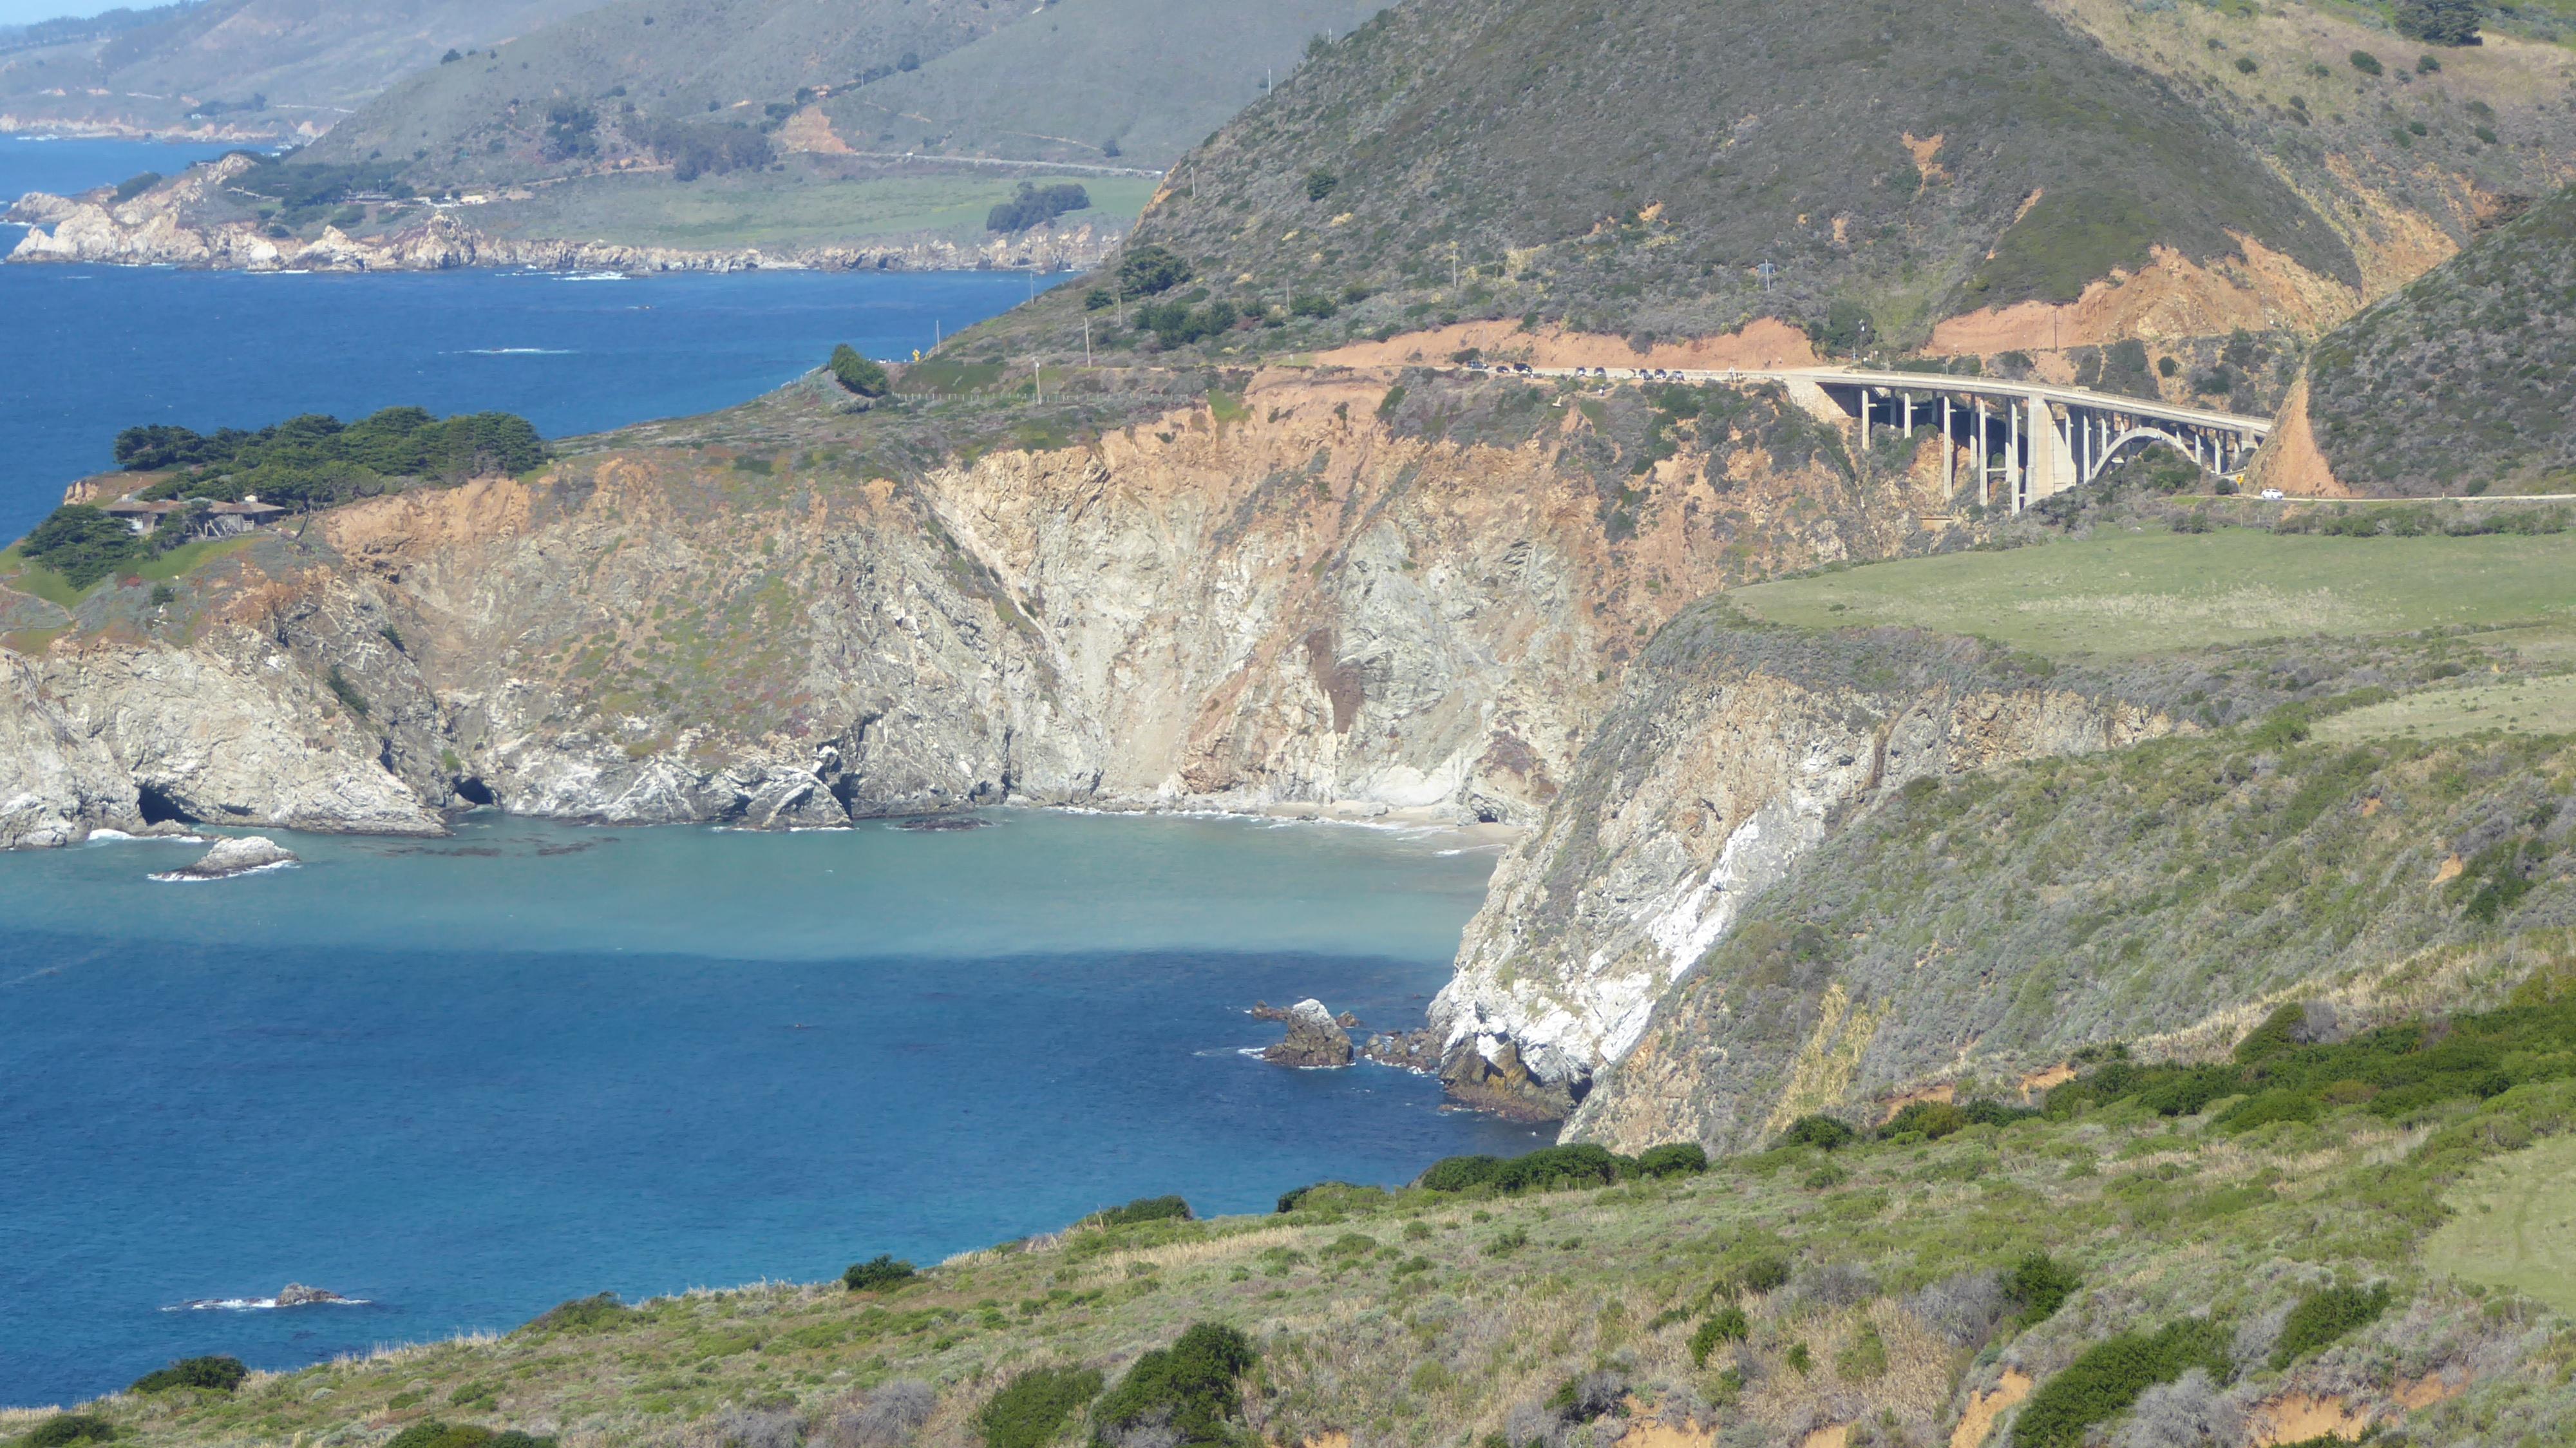 Highway One -Carmel to Big Sur (106) - Copy